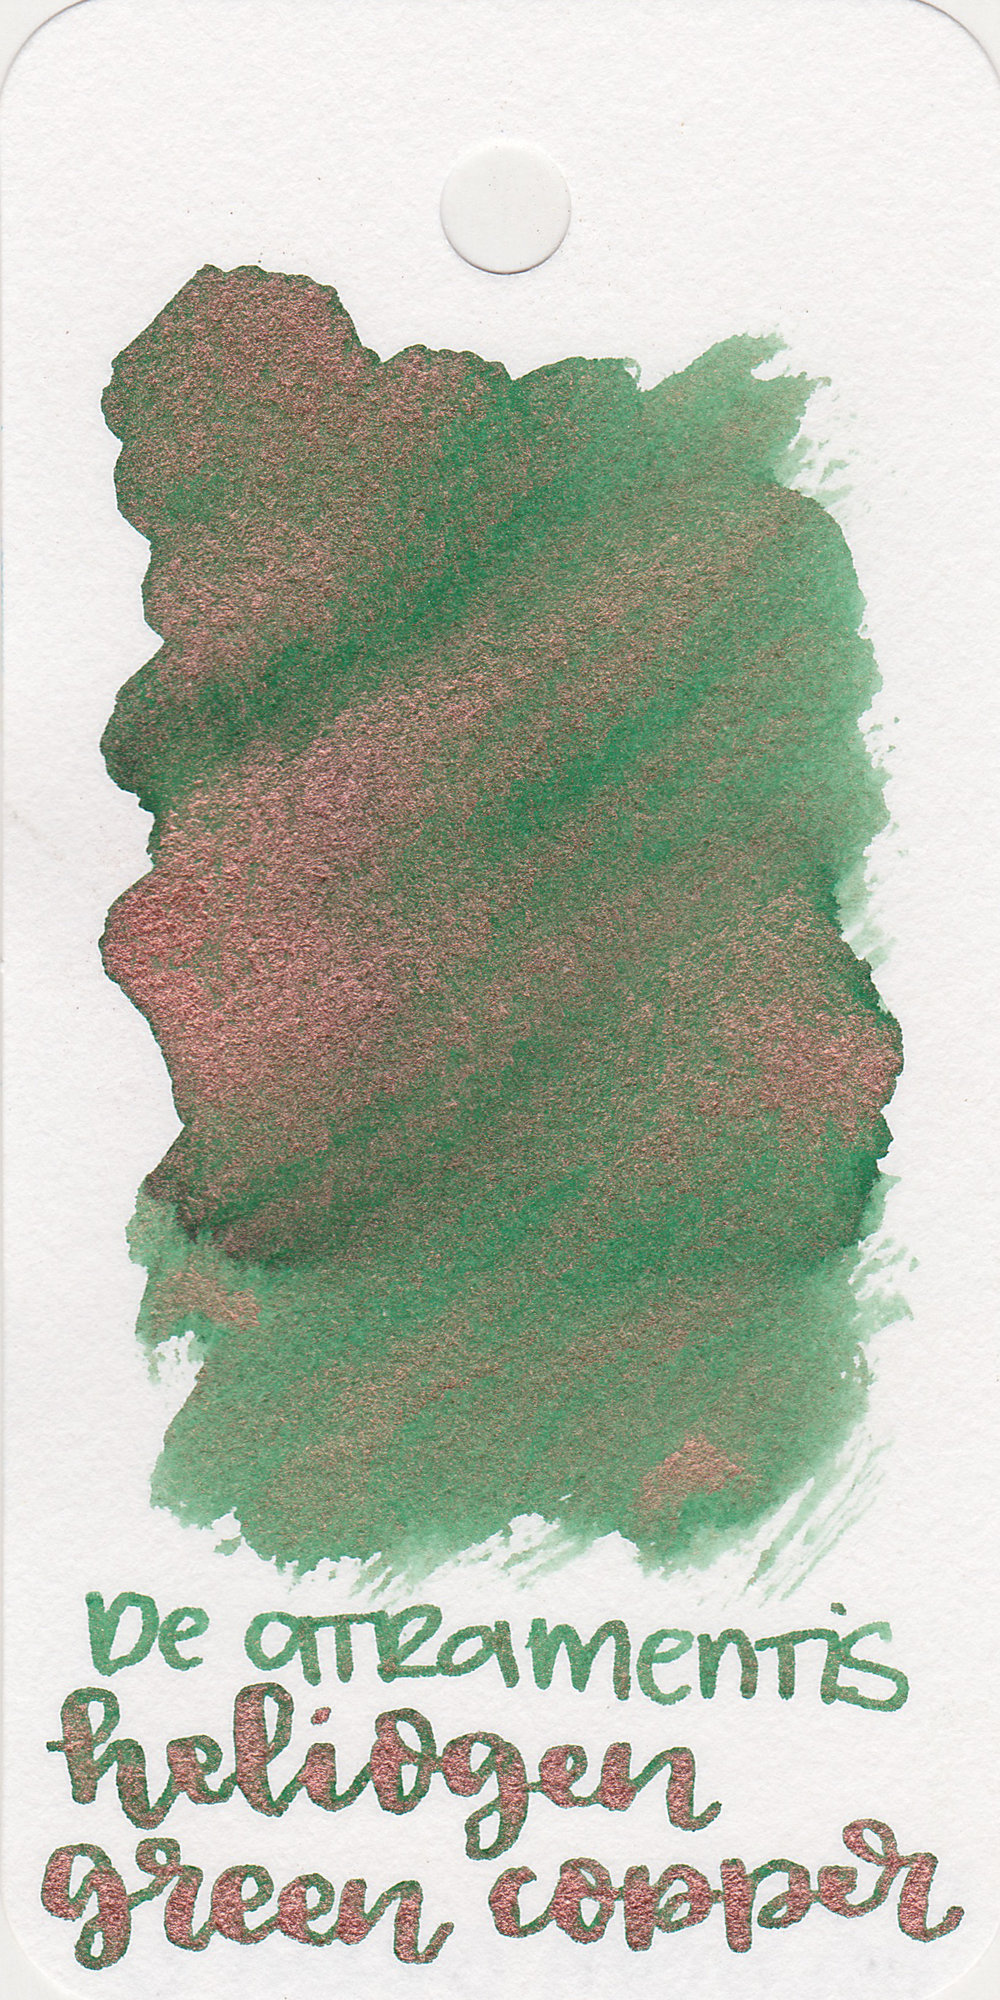 da-heliogen-green-4.jpg